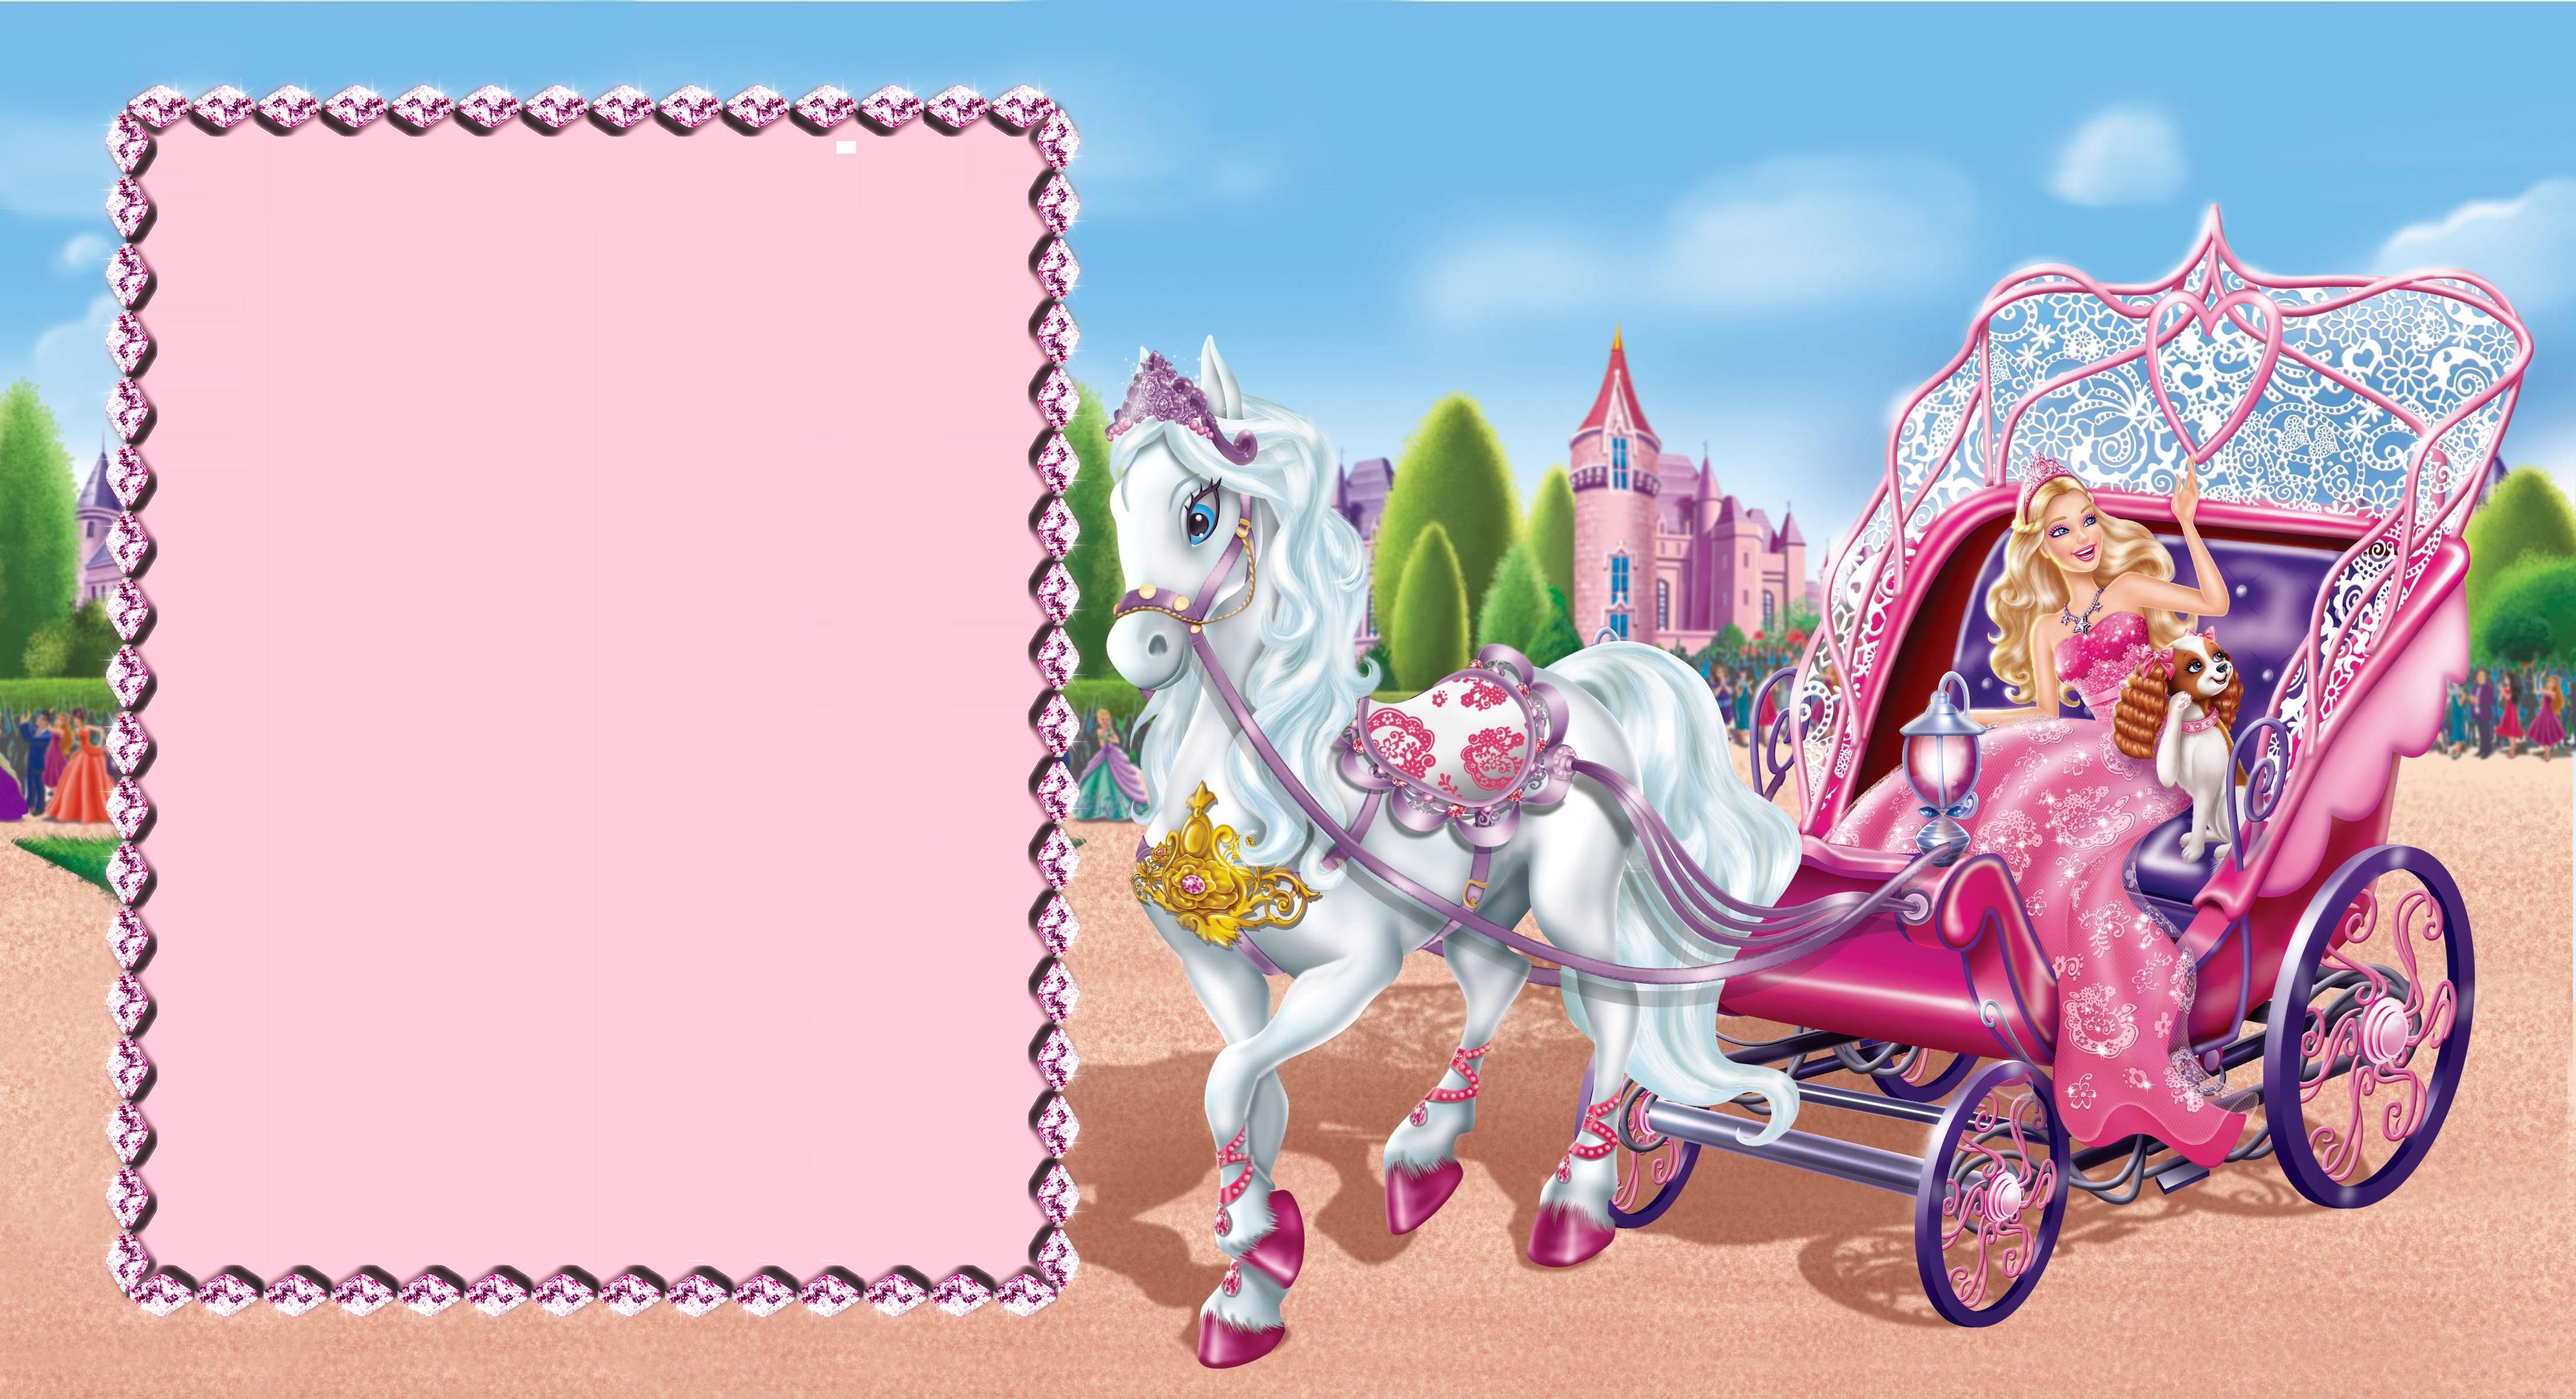 Barbie clipart borders. Cute transparent photo frame